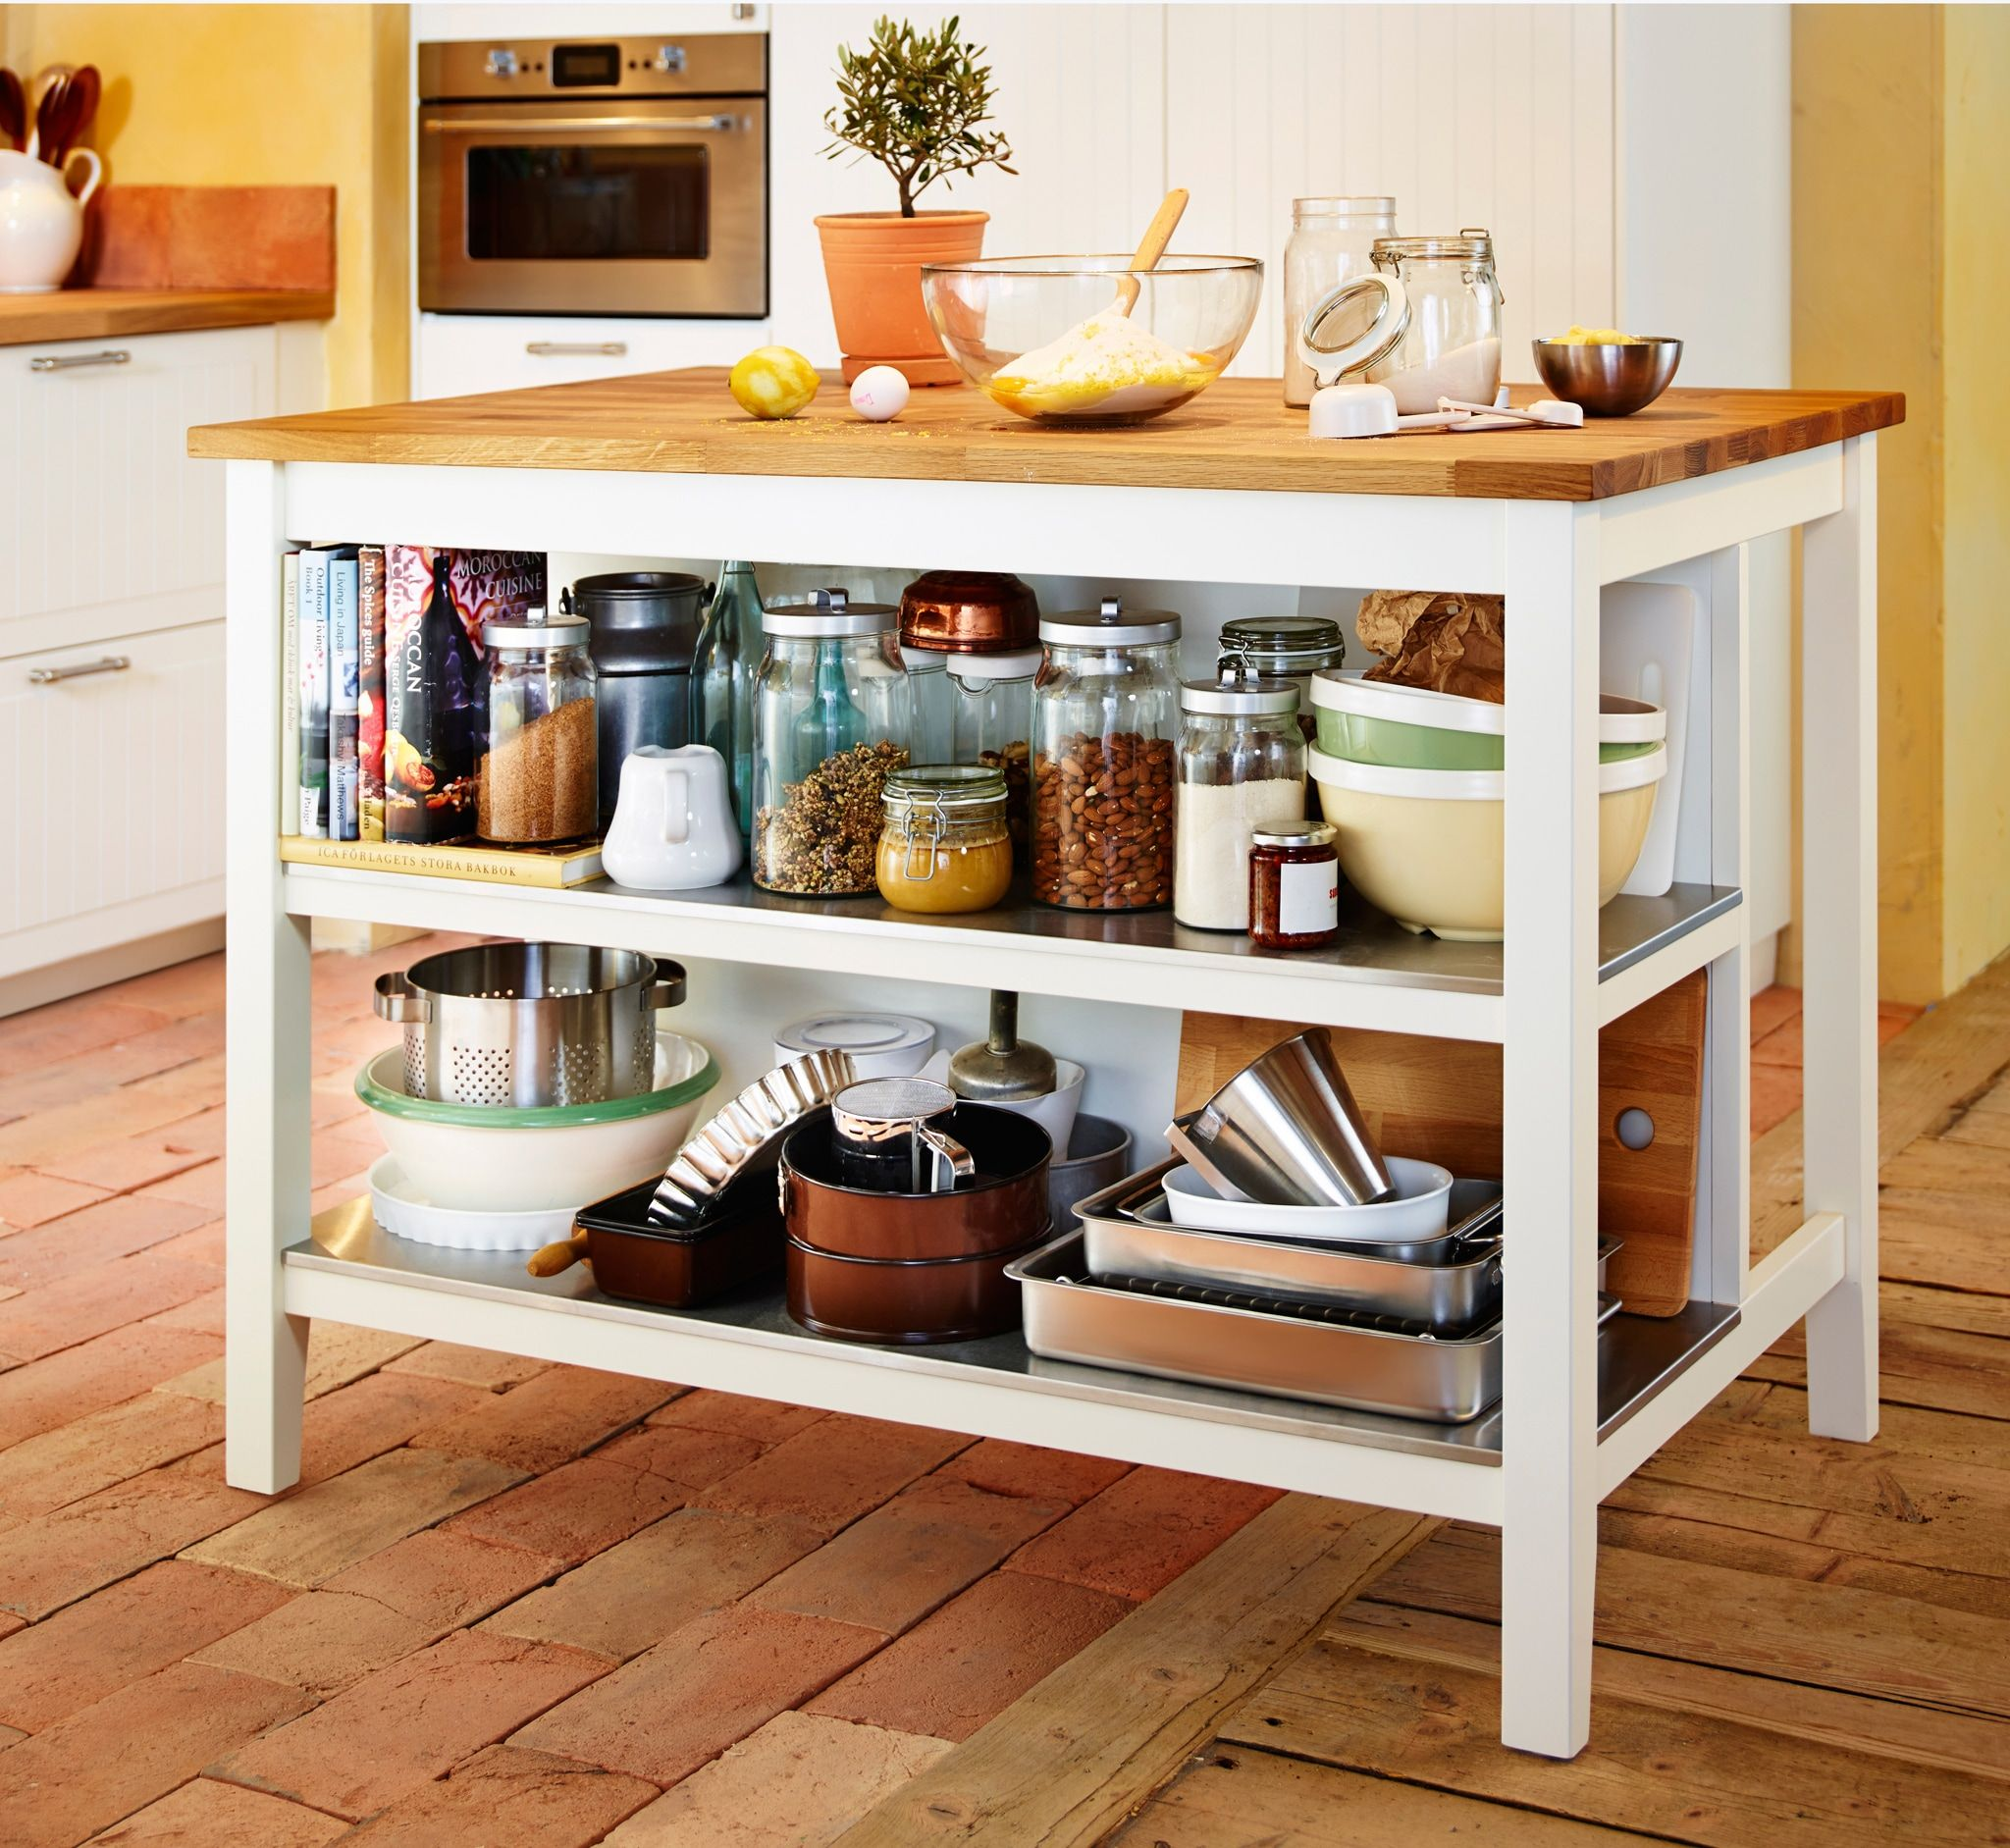 Kitchen organisation ideas for a well planned kitchen ...